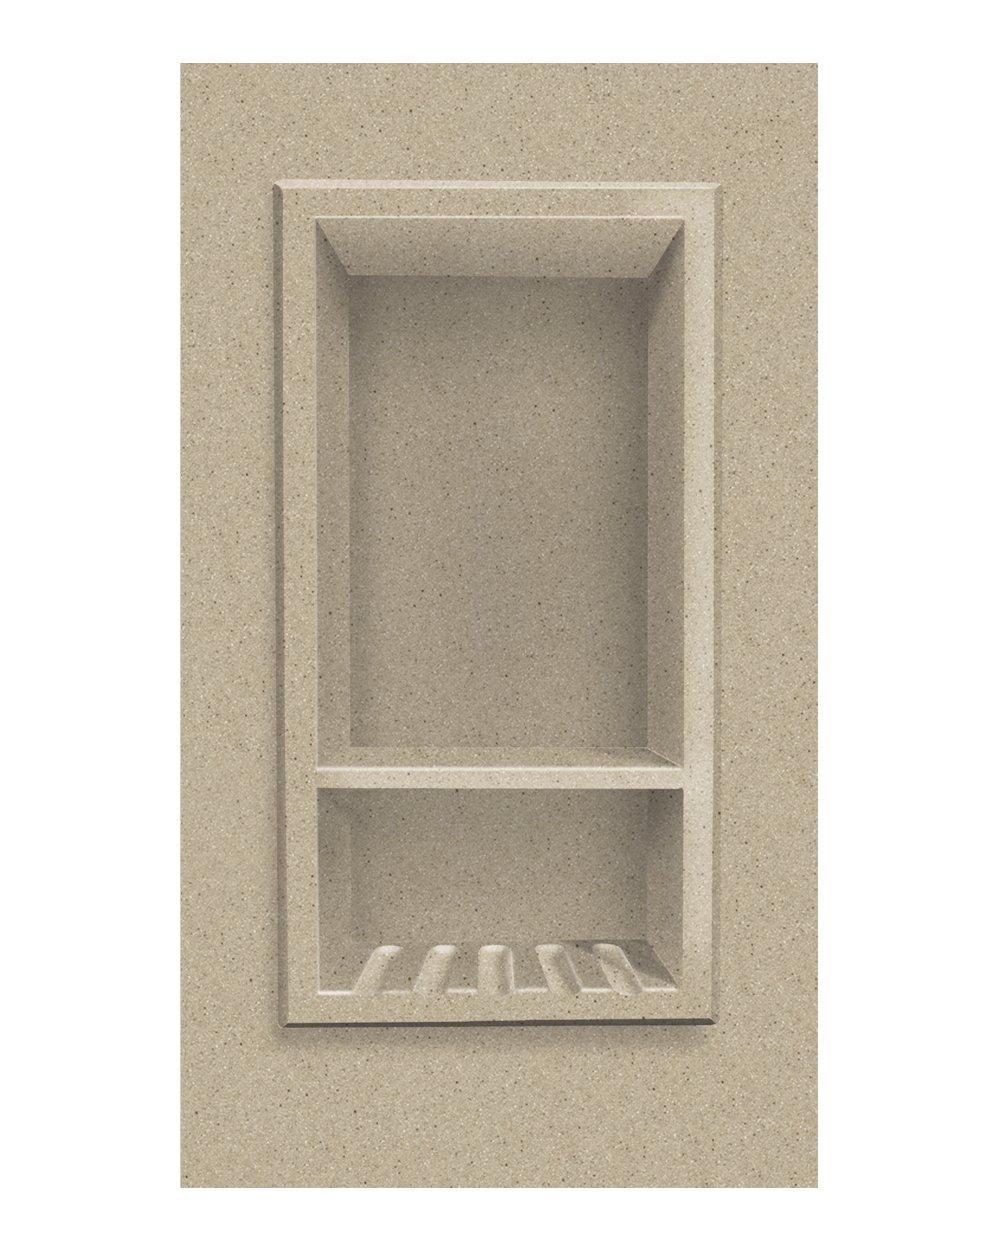 Transolid ACCESS0002-B2 Decor 7-1/2 x 15-Inch Recessed Shampoo Caddy, Matrix Sand by Transolid